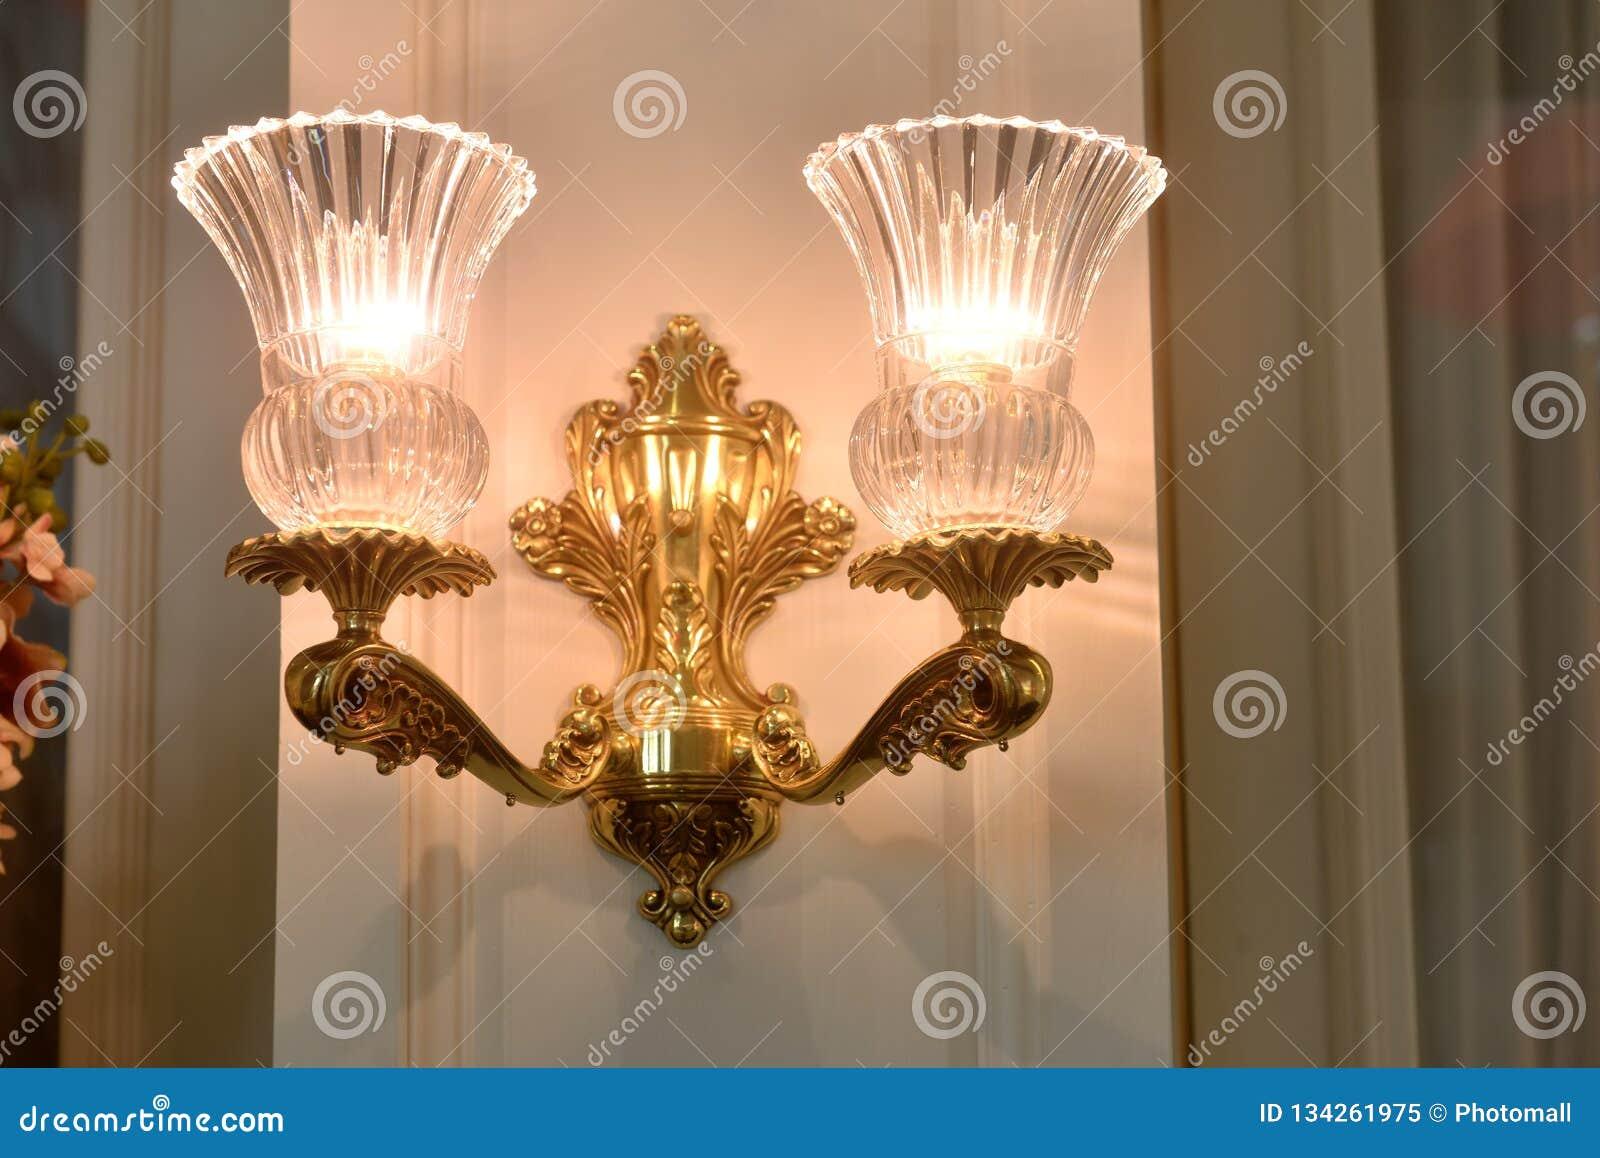 Wall Fitting Bracket Light Wall Lamp Stock Image Image Of City Elegant 134261975